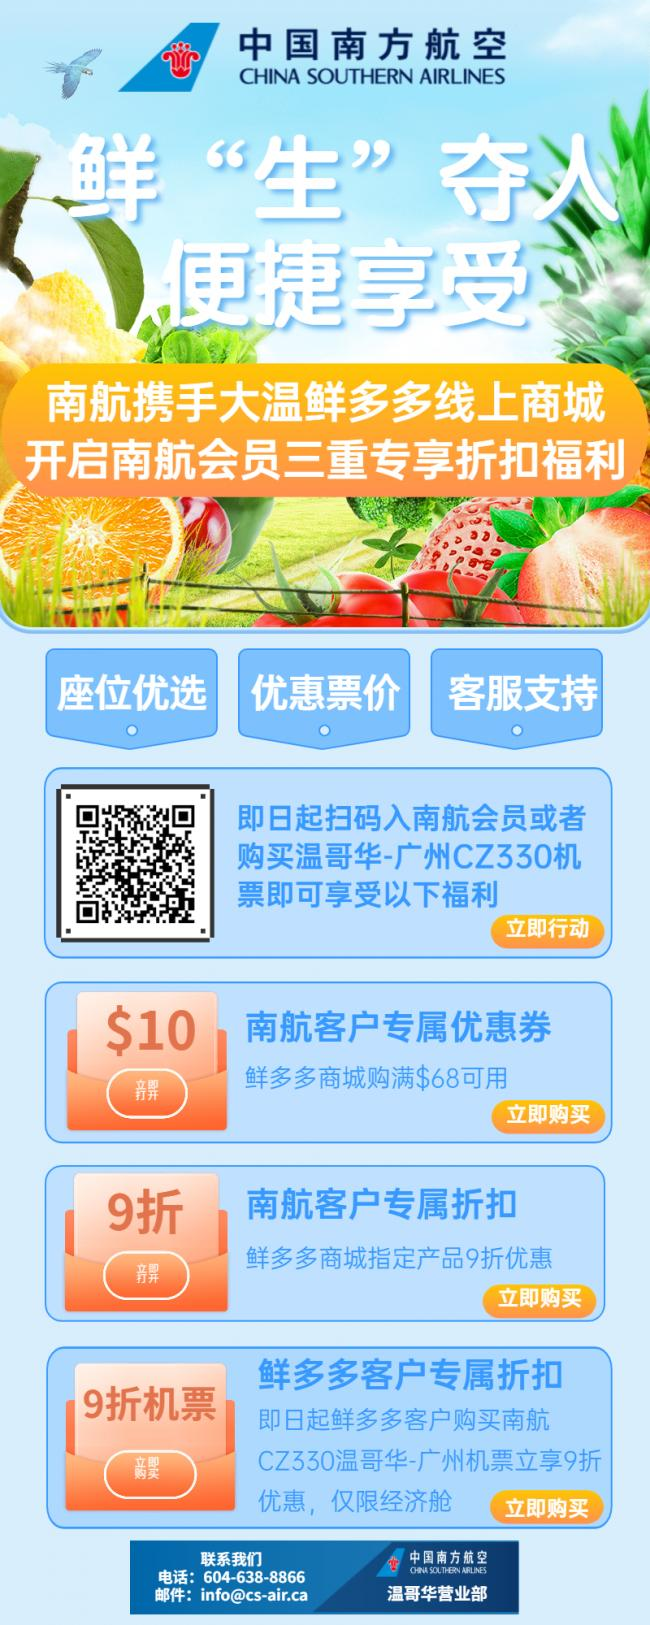 WeChat Image_20210406160723.png